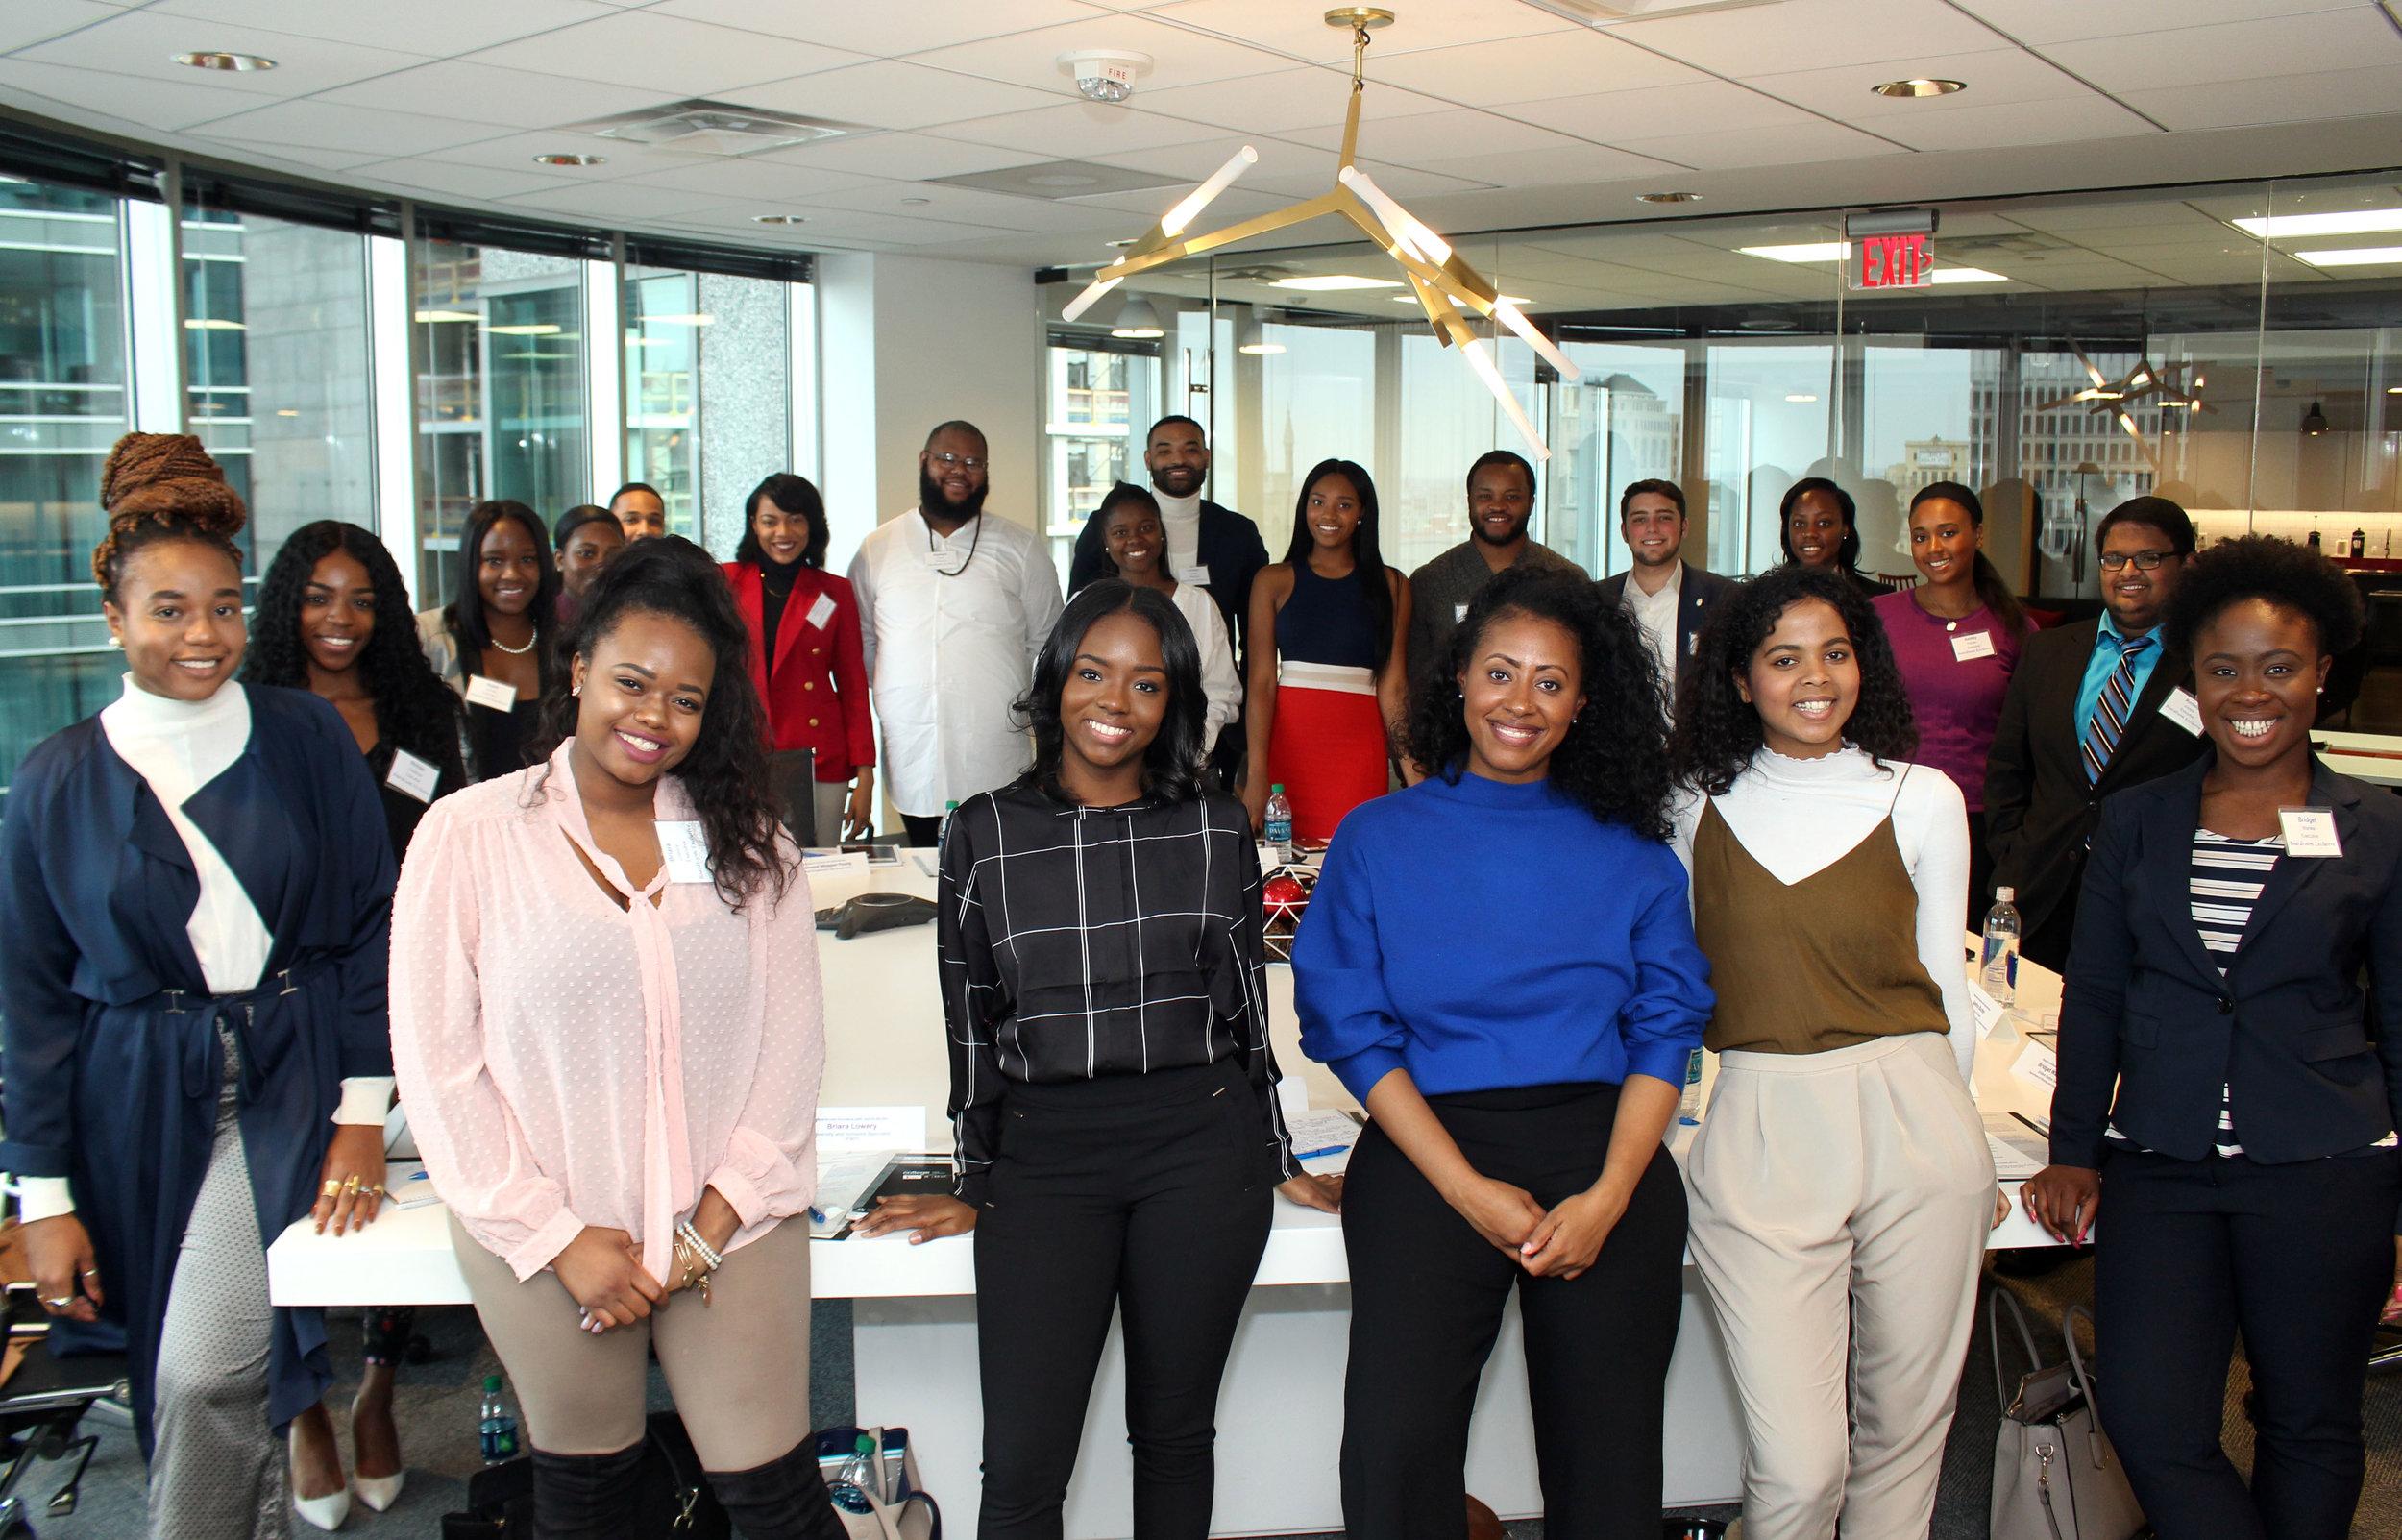 2017 Honoree Jamira Burley and Kyshon (M) alongside Future Executives.